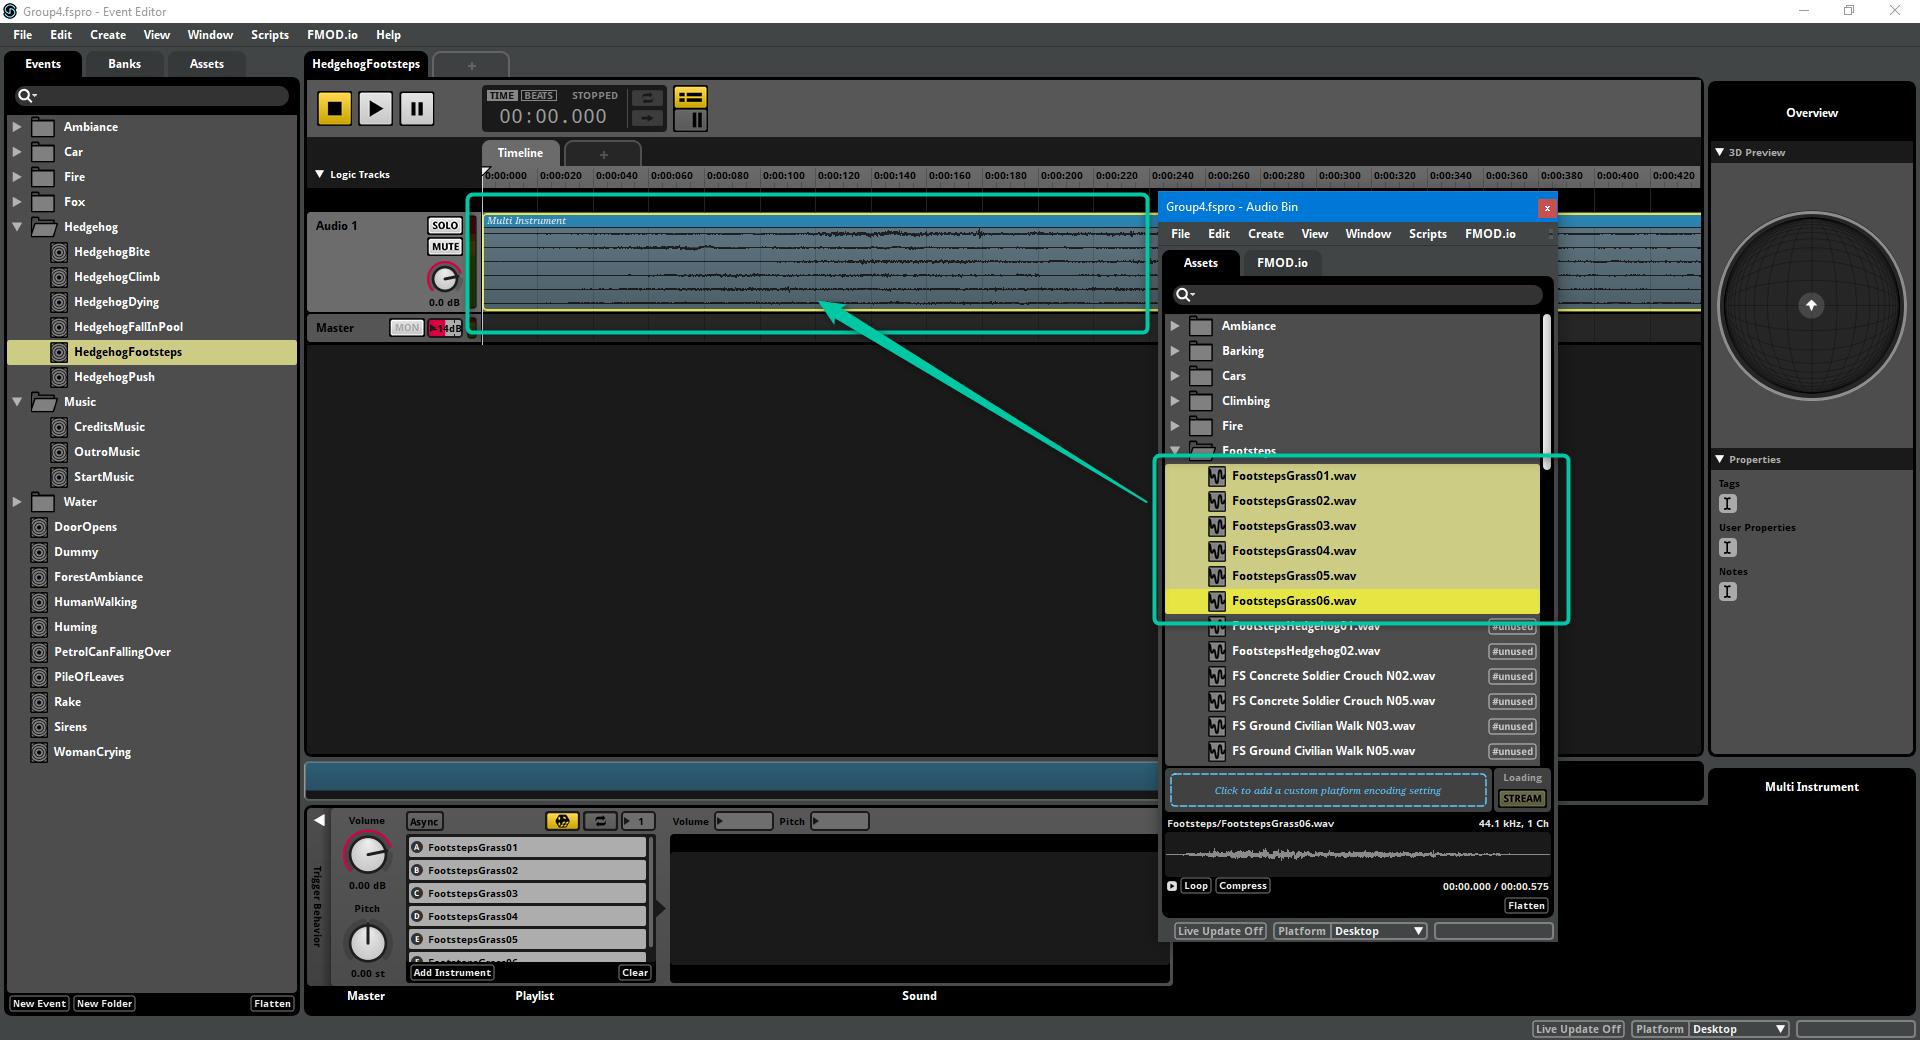 FMOD: Multi Instrument.